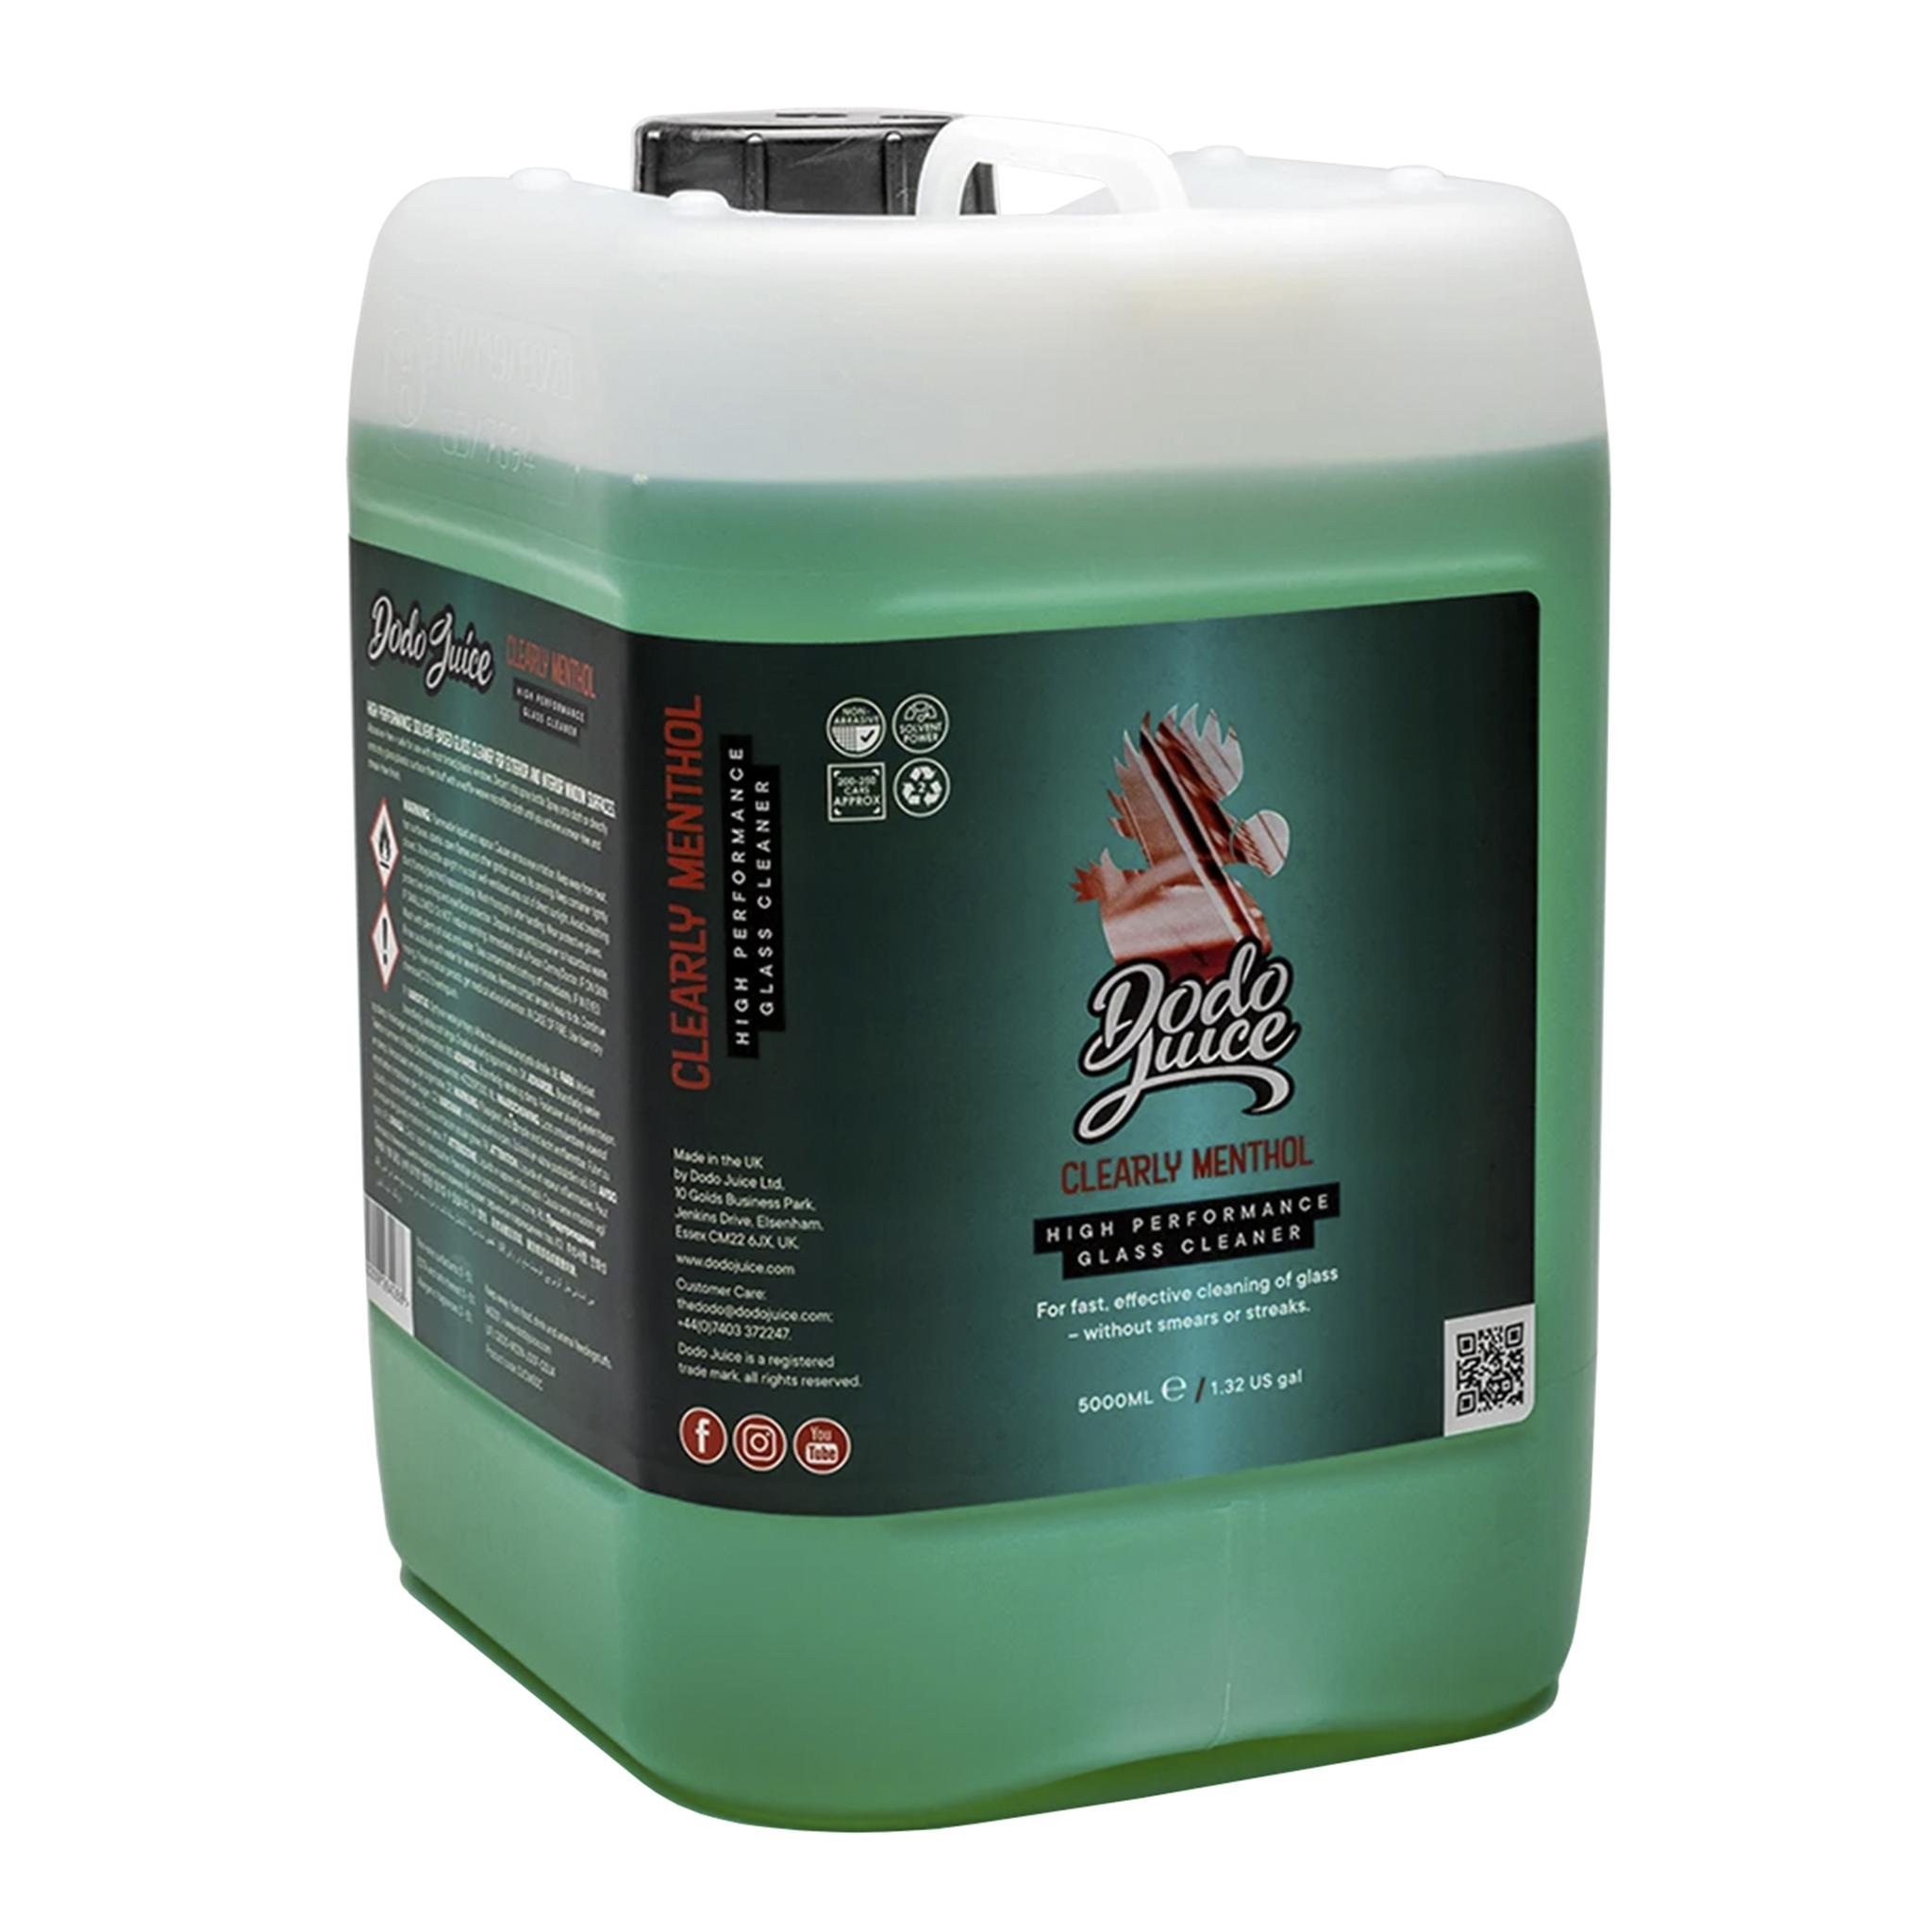 Glasrengöring Dodo Juice Clearly Menthol, 5000 ml